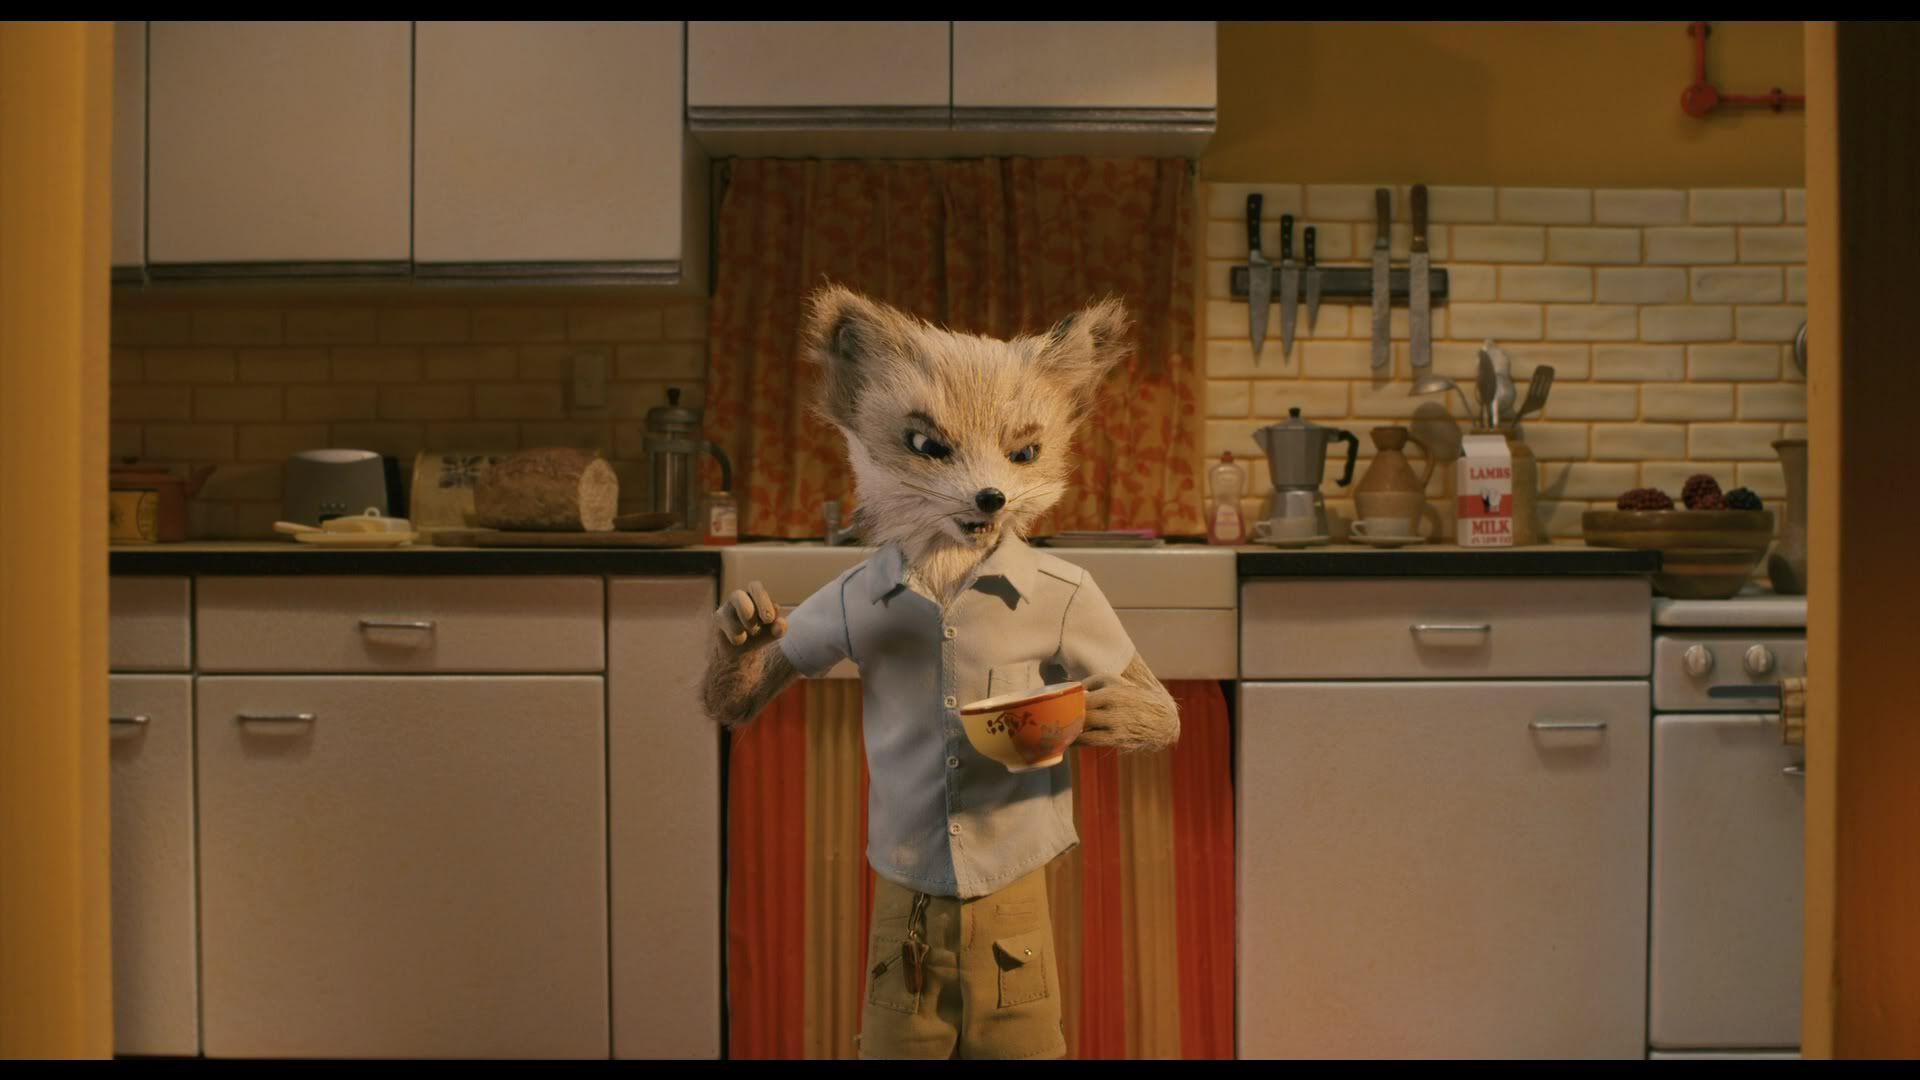 Fantastic Mr Fox Theme Song 7 Jpg 1920 1080 Wes Anderson Films Fantastic Mr Fox Fantastic Mr Fox Movie